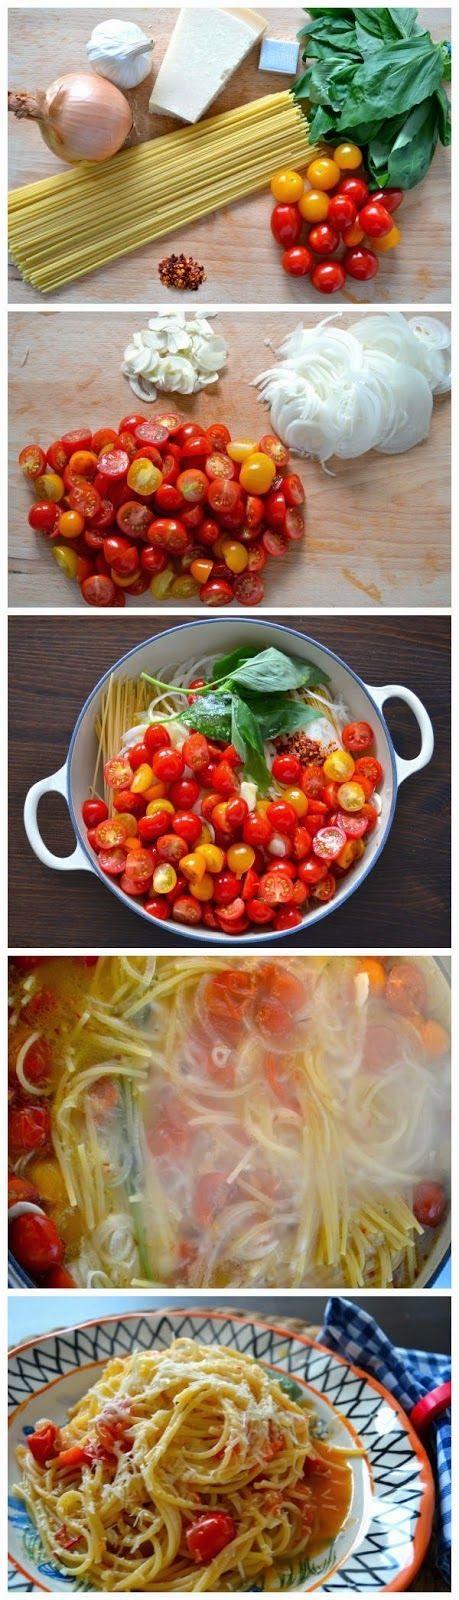 ... about Pasta on Pinterest | Ramen, Tomato basil pasta and One pot pasta